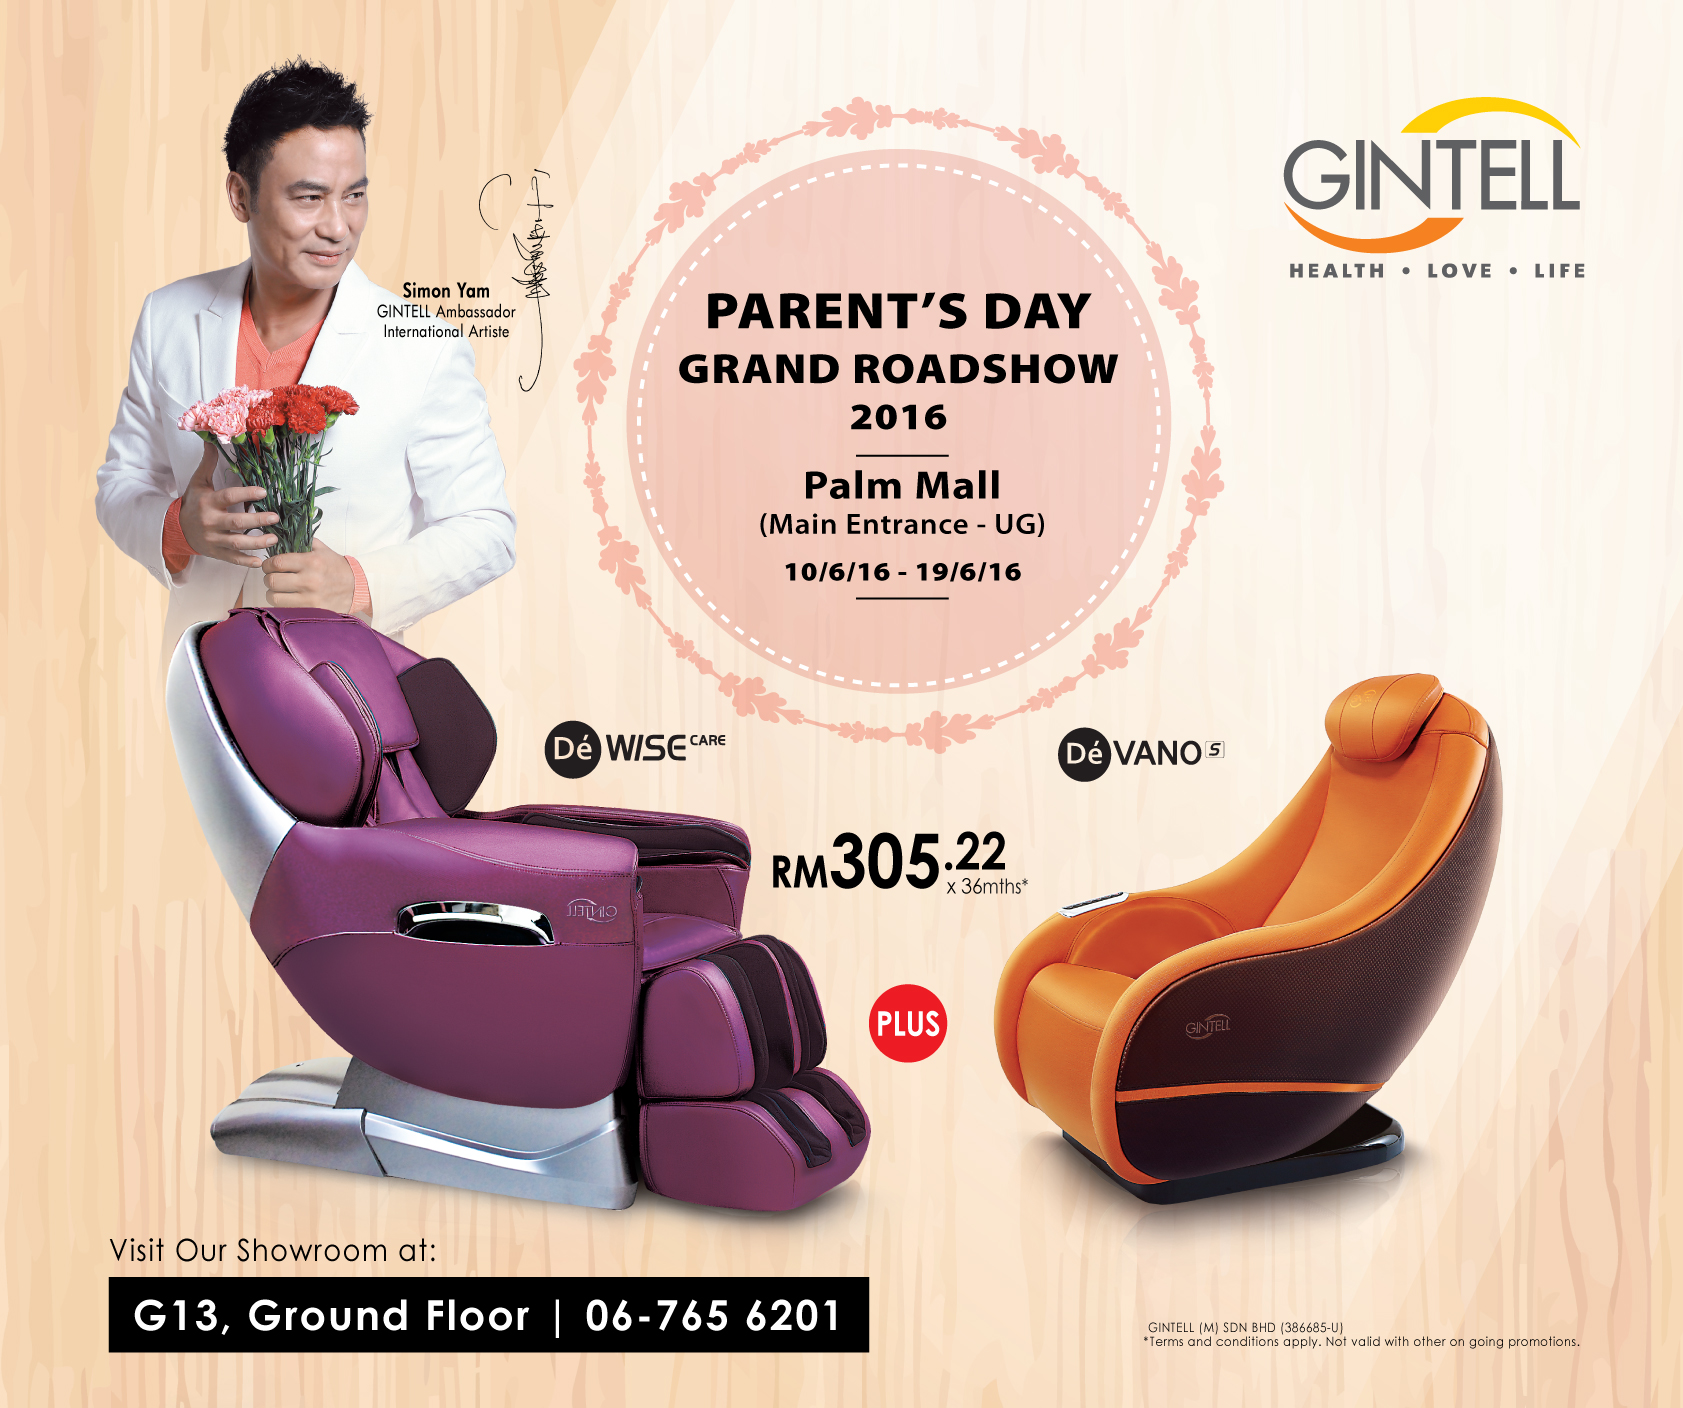 Parents' Day Grand Roadshow